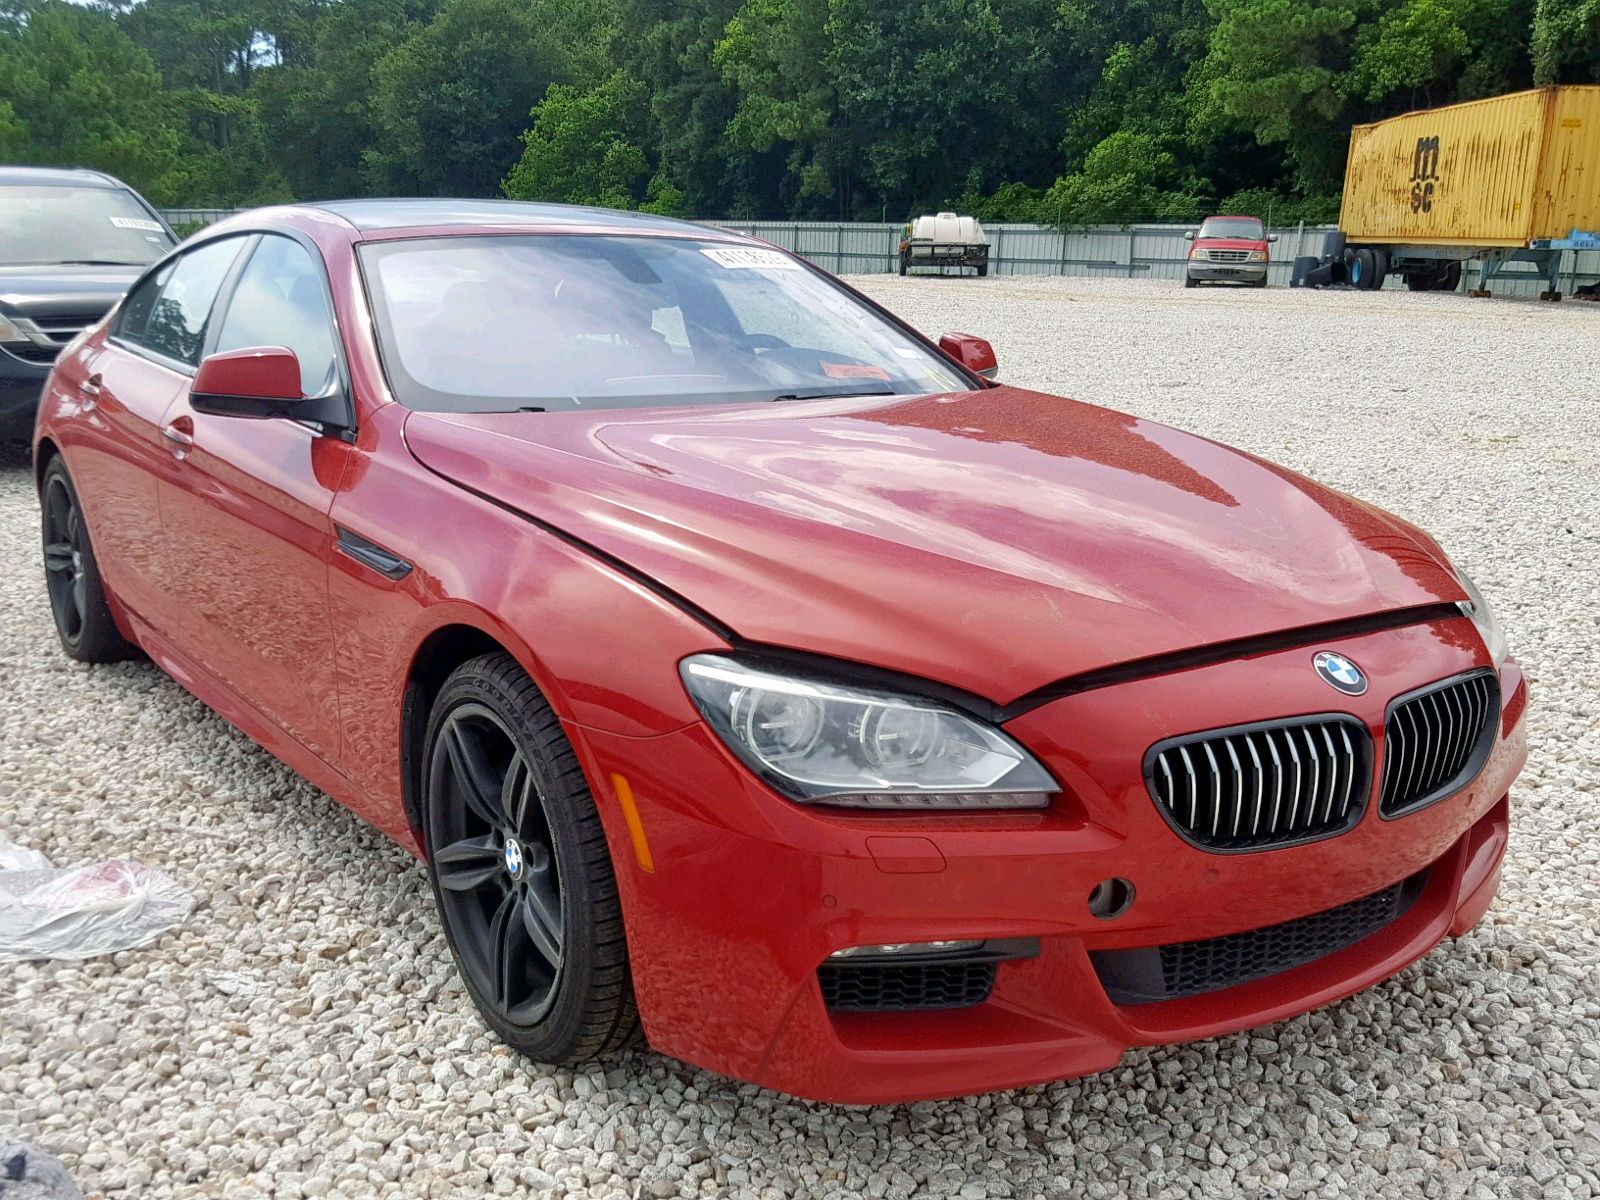 BMW 640 XI 2014, WBA6B8C54ED452721 | Auto Auction Spot